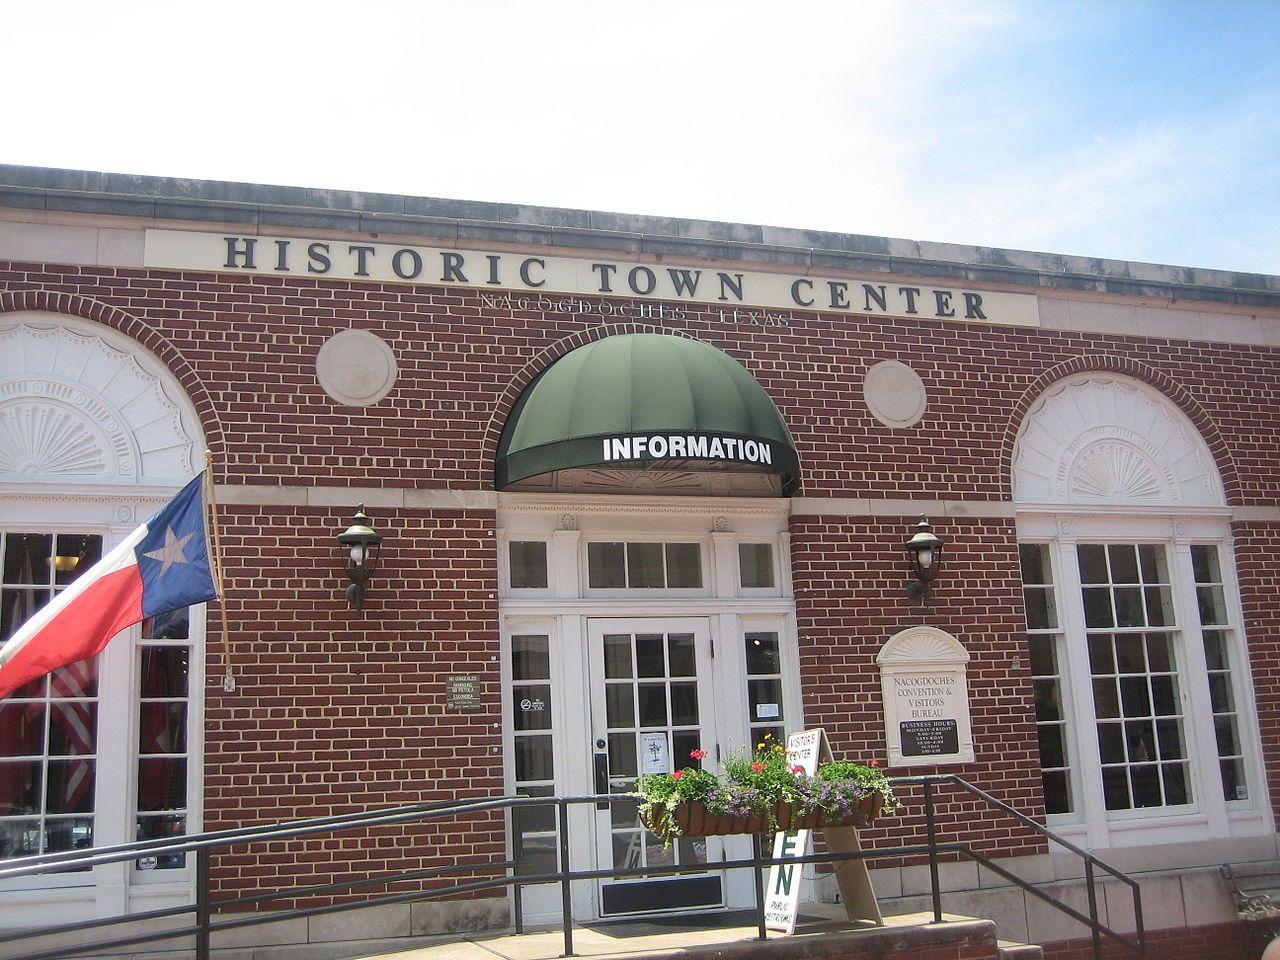 Historic Town Center in Nacogdoches, TX IMG 0971 - Nacogdoches, Texas - Wikipedia, the free encyclopedia